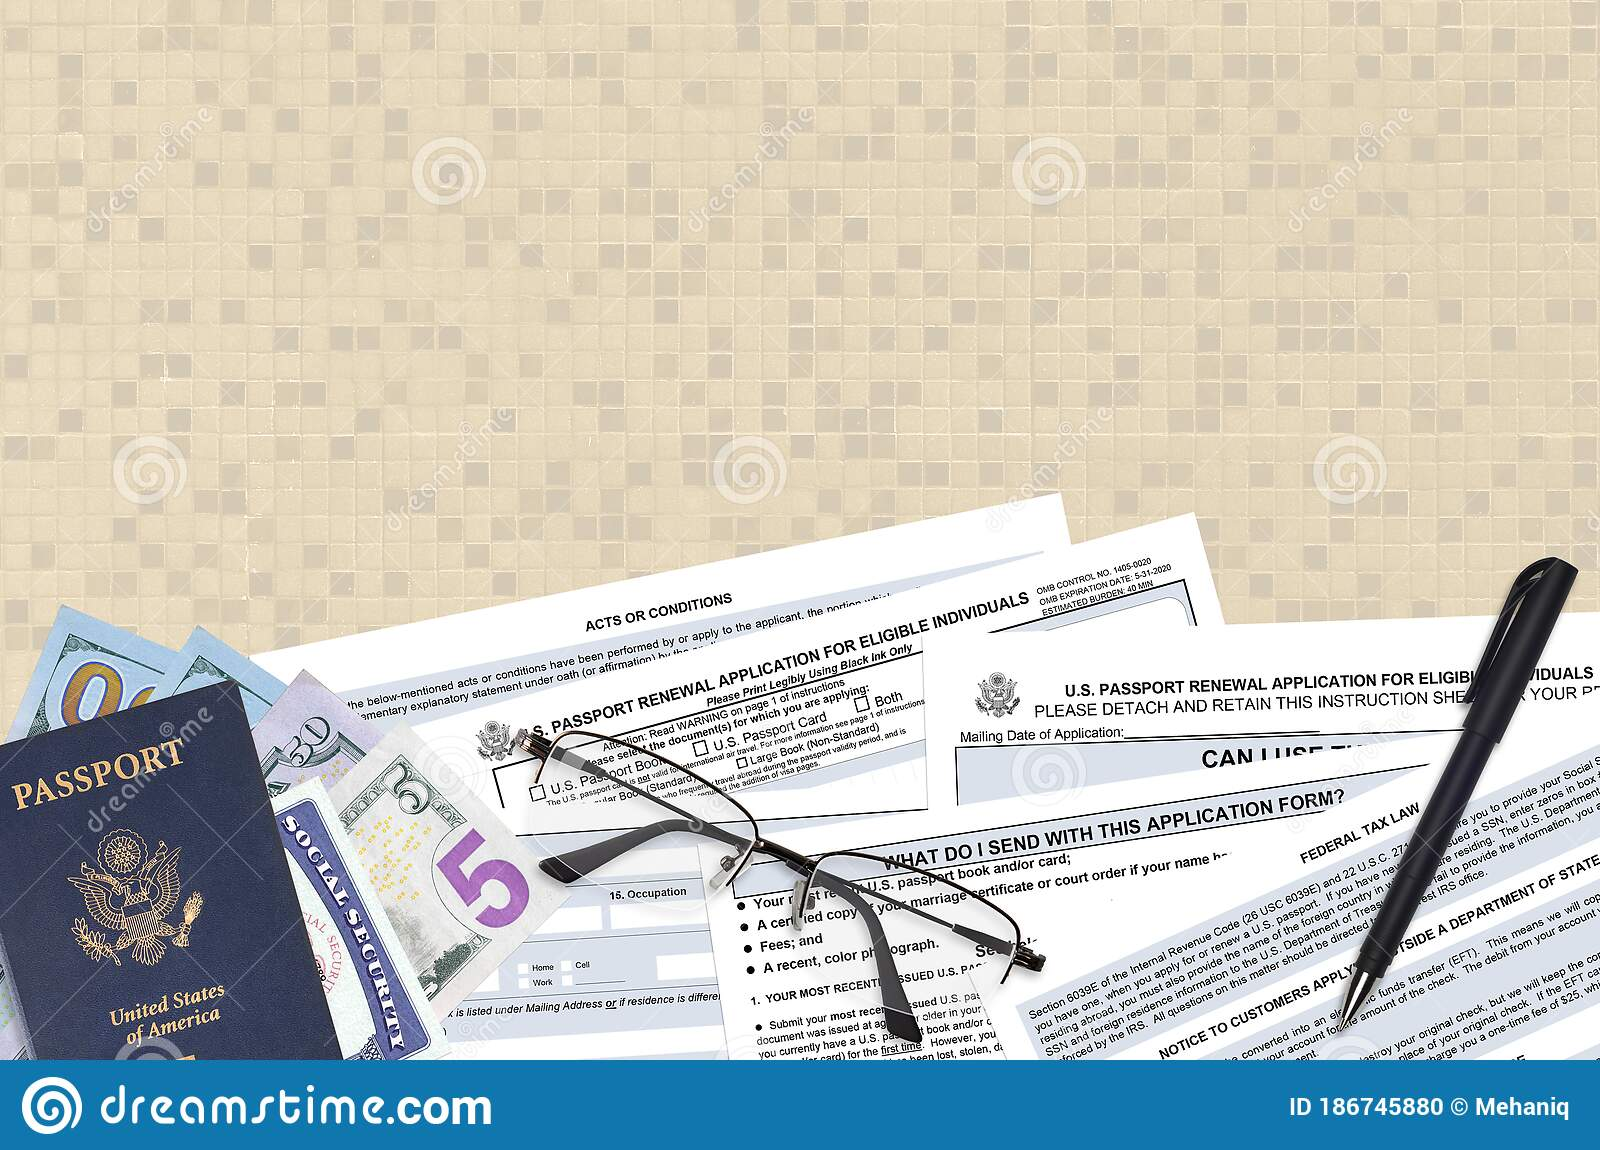 Fillable Online photos state AFFIDAVIT OF DAMAGE PASSPORT